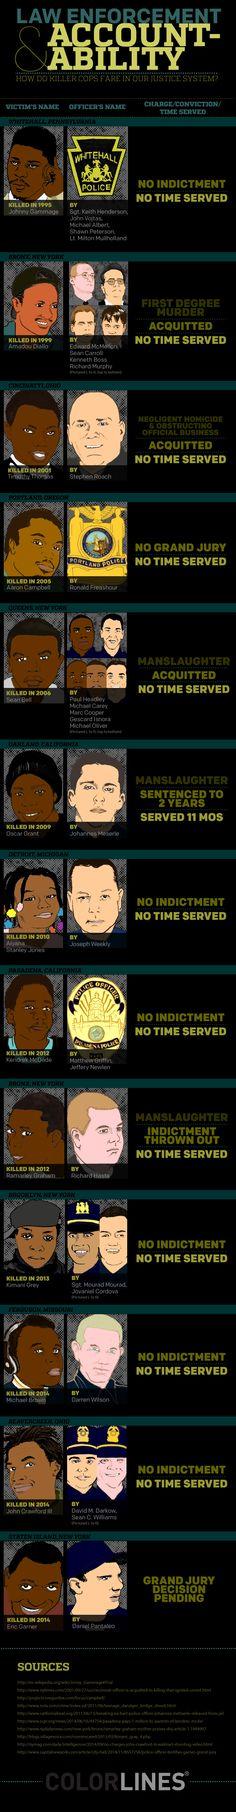 Mass Incarceration The New Jim Crow Neoslavery